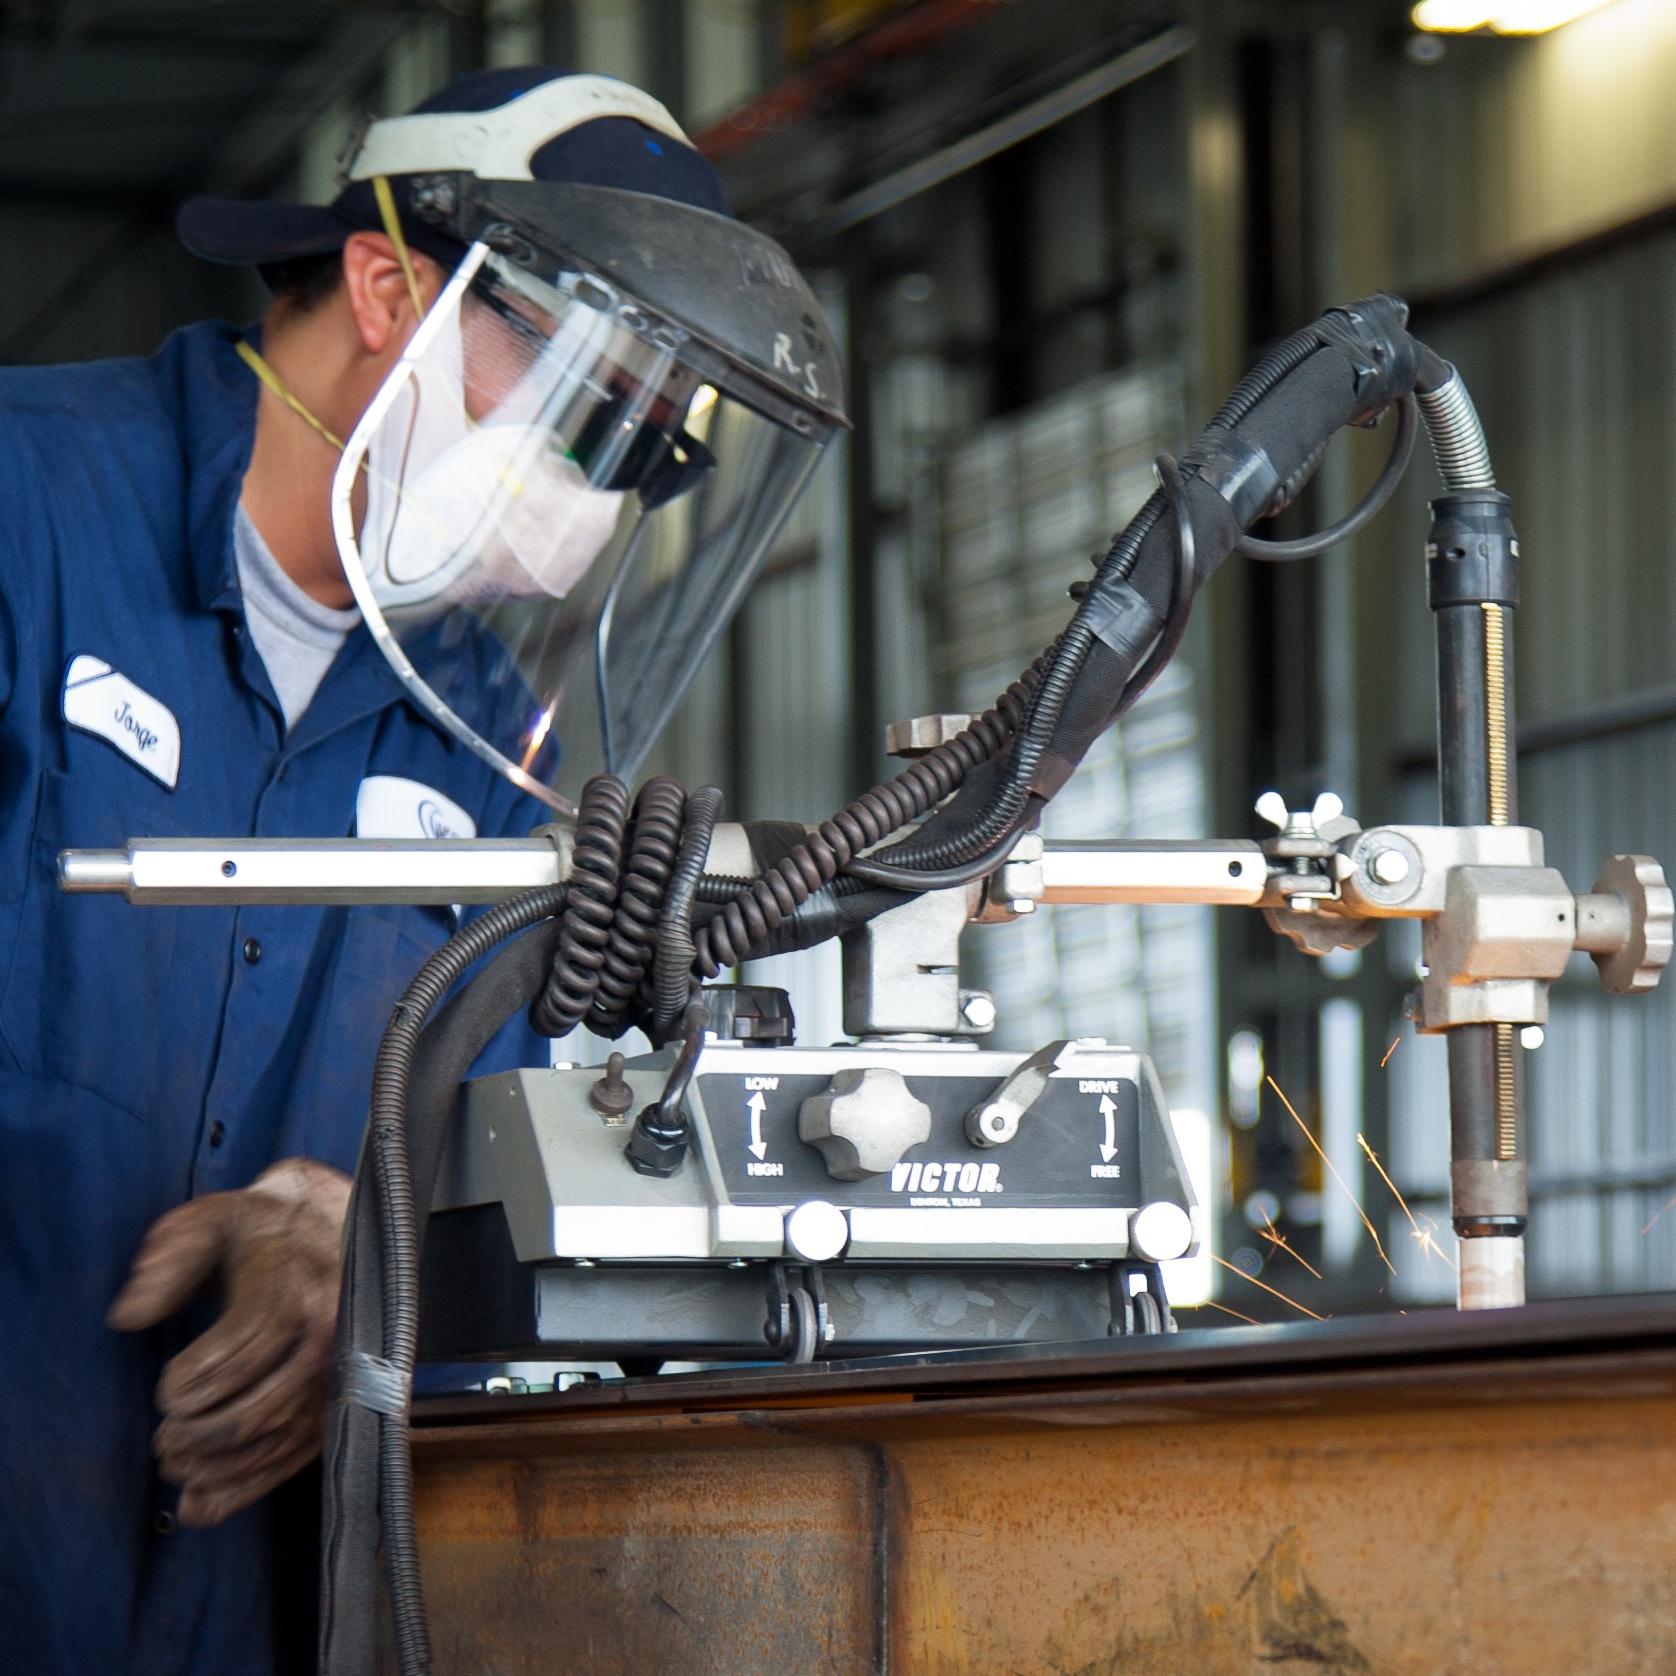 GasApparatus-Crop-Othergasproductaccessories.jpg